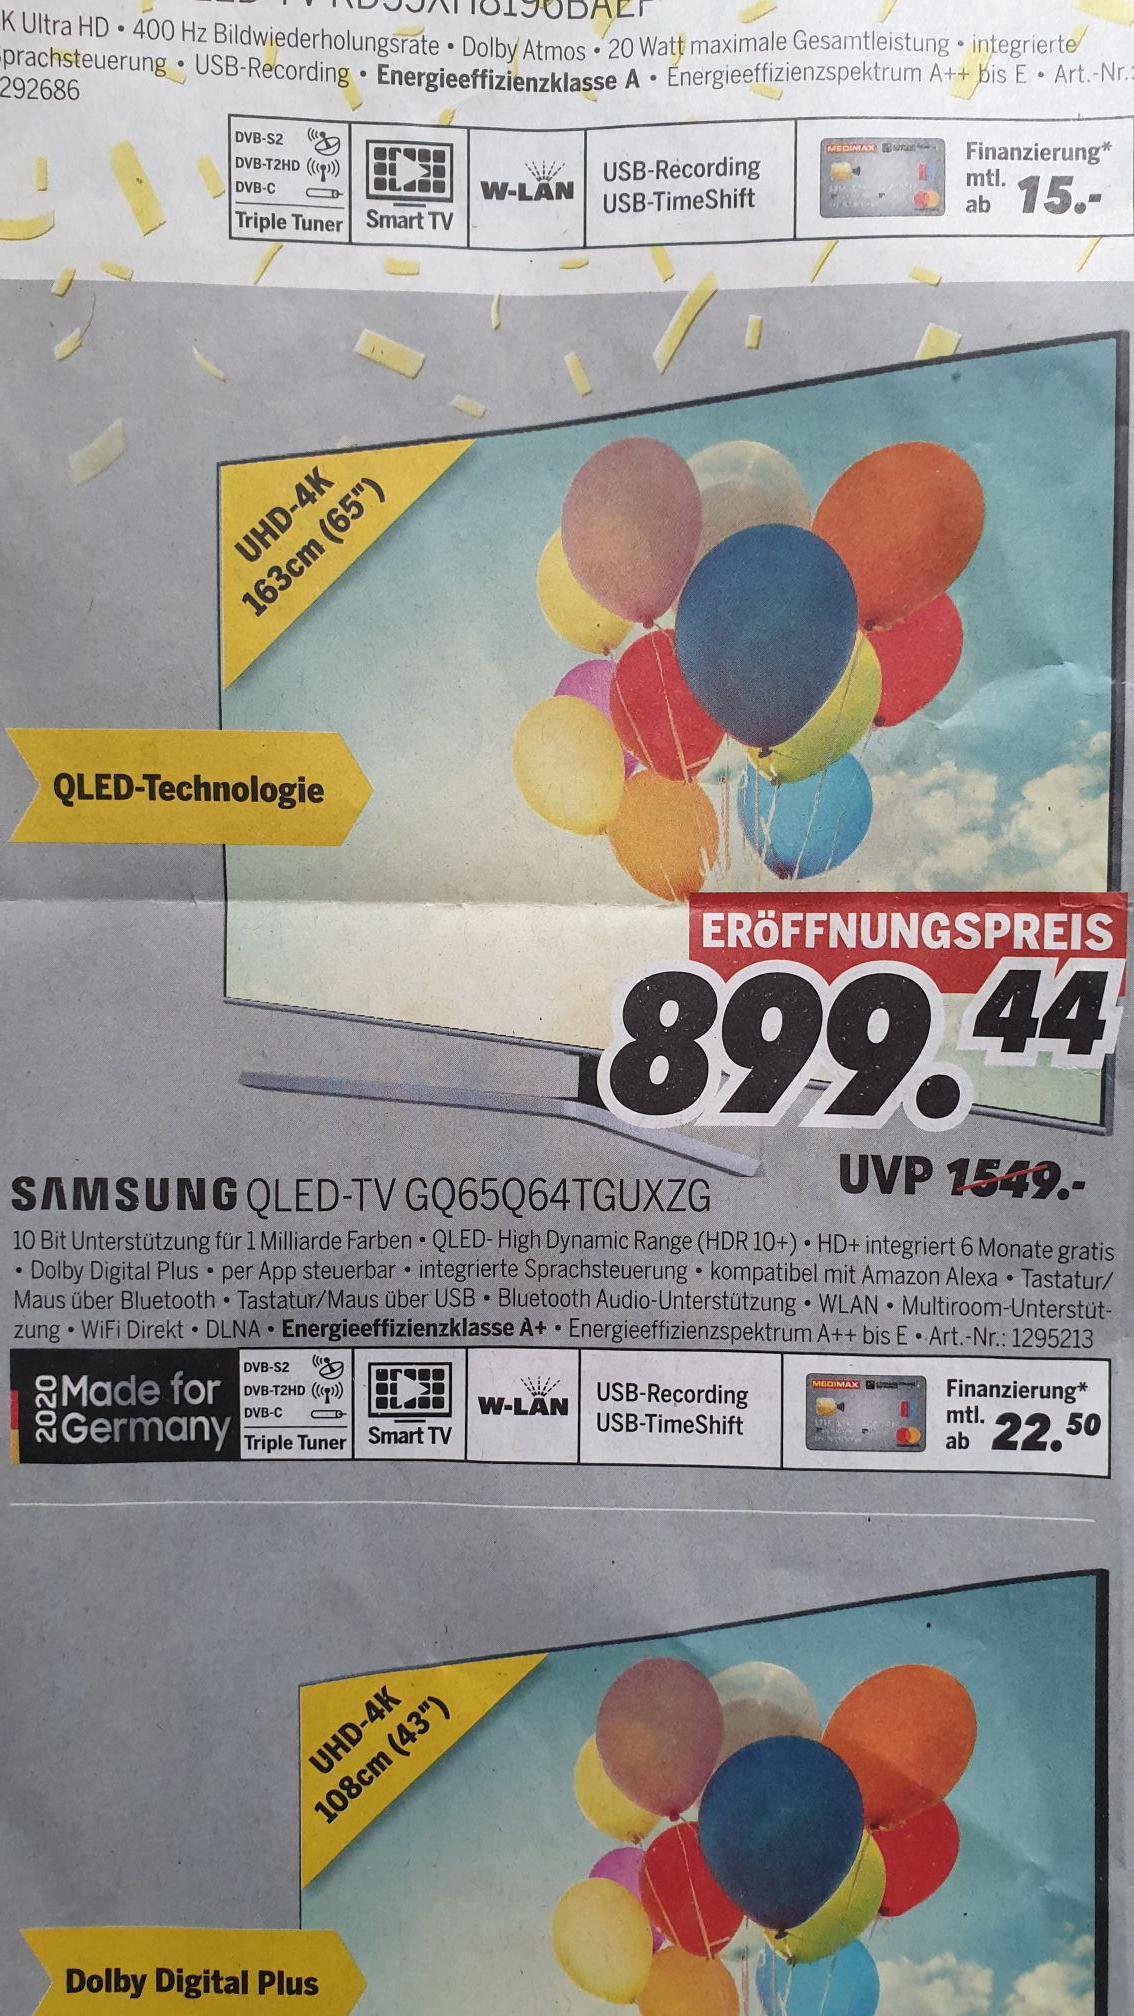 Lokal Duderstadt, Jena, Halberstadt, Sangerhausen Samsung QLED-TV GQ65Q64TGUXZG